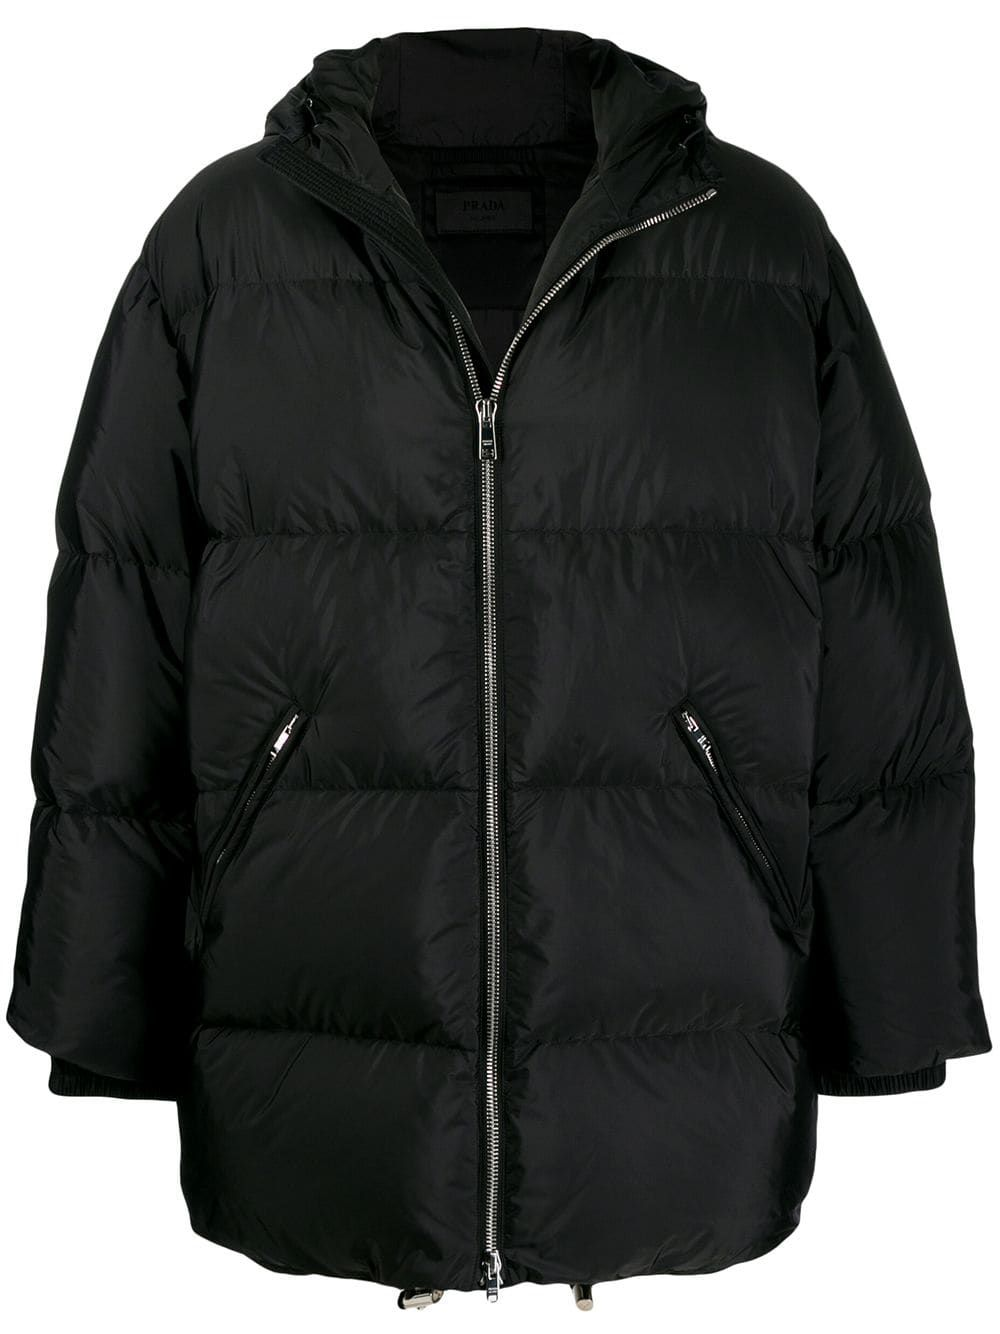 Oversized Padded Coat Padded Coat Prada Puffer Coat [ 1334 x 1000 Pixel ]